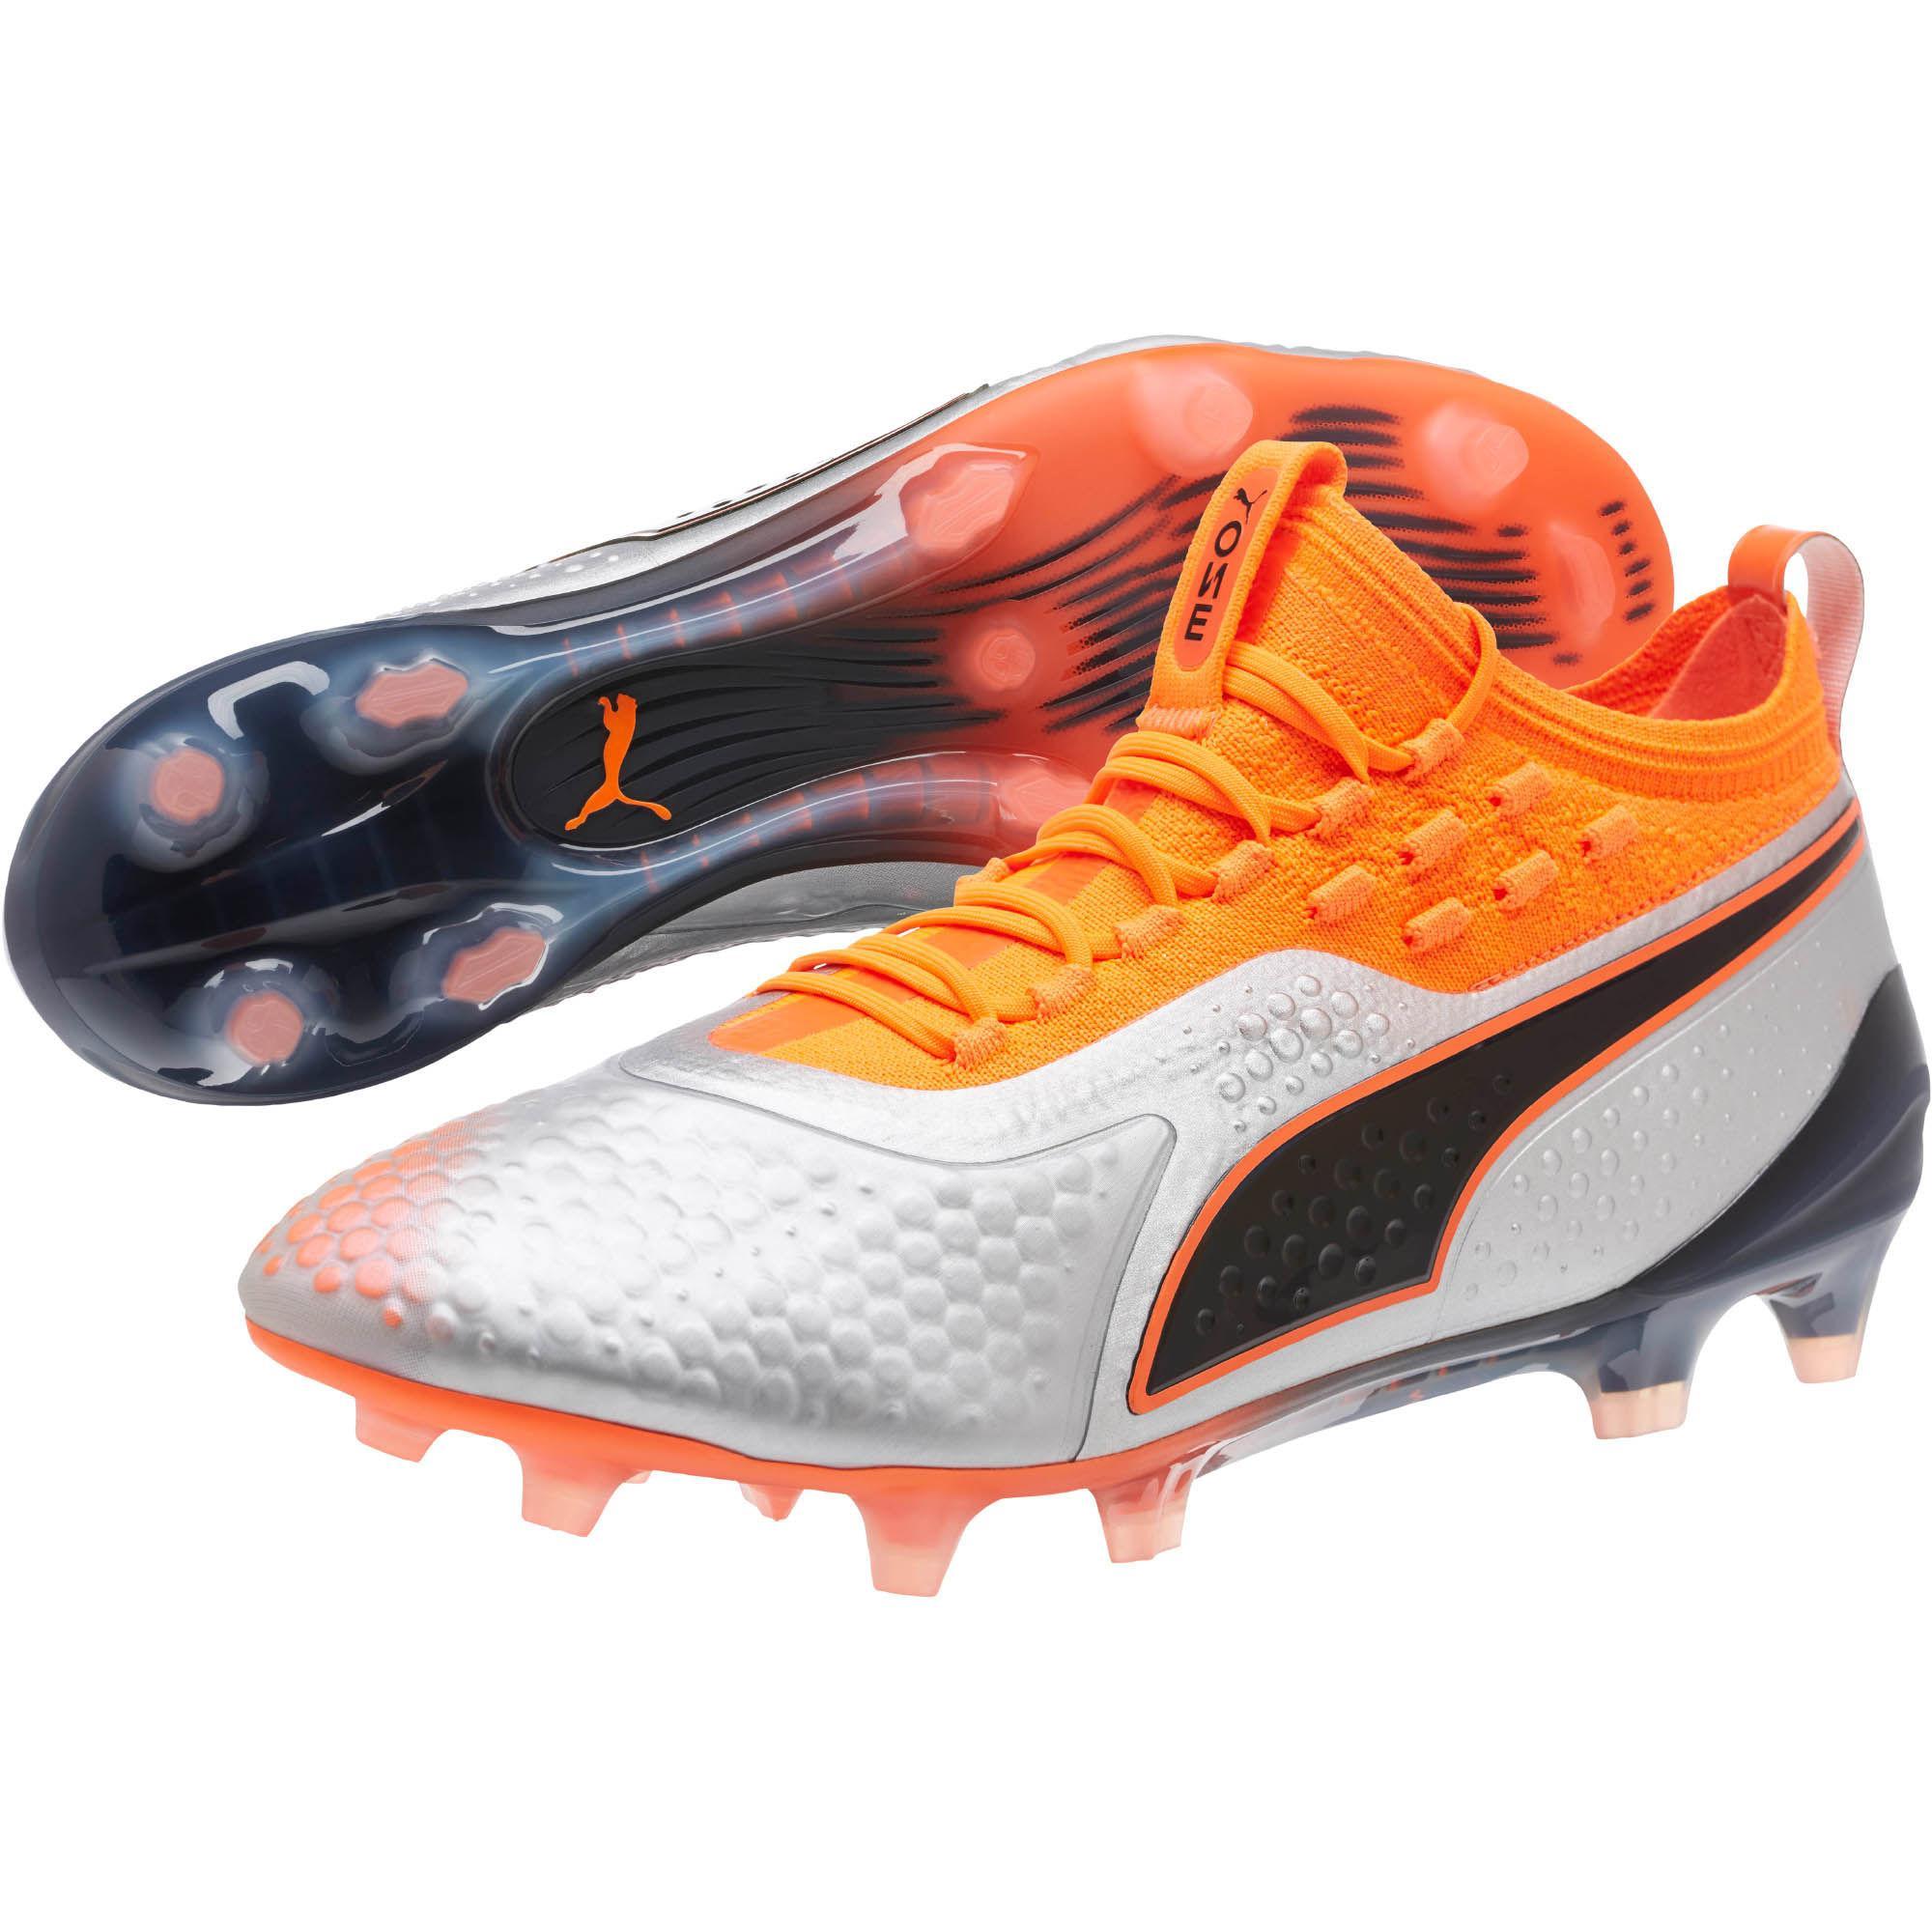 54ed1f81a631 PUMA - Orange One 1 Lth Mx Sg Footbal Shoes for Men - Lyst. View fullscreen